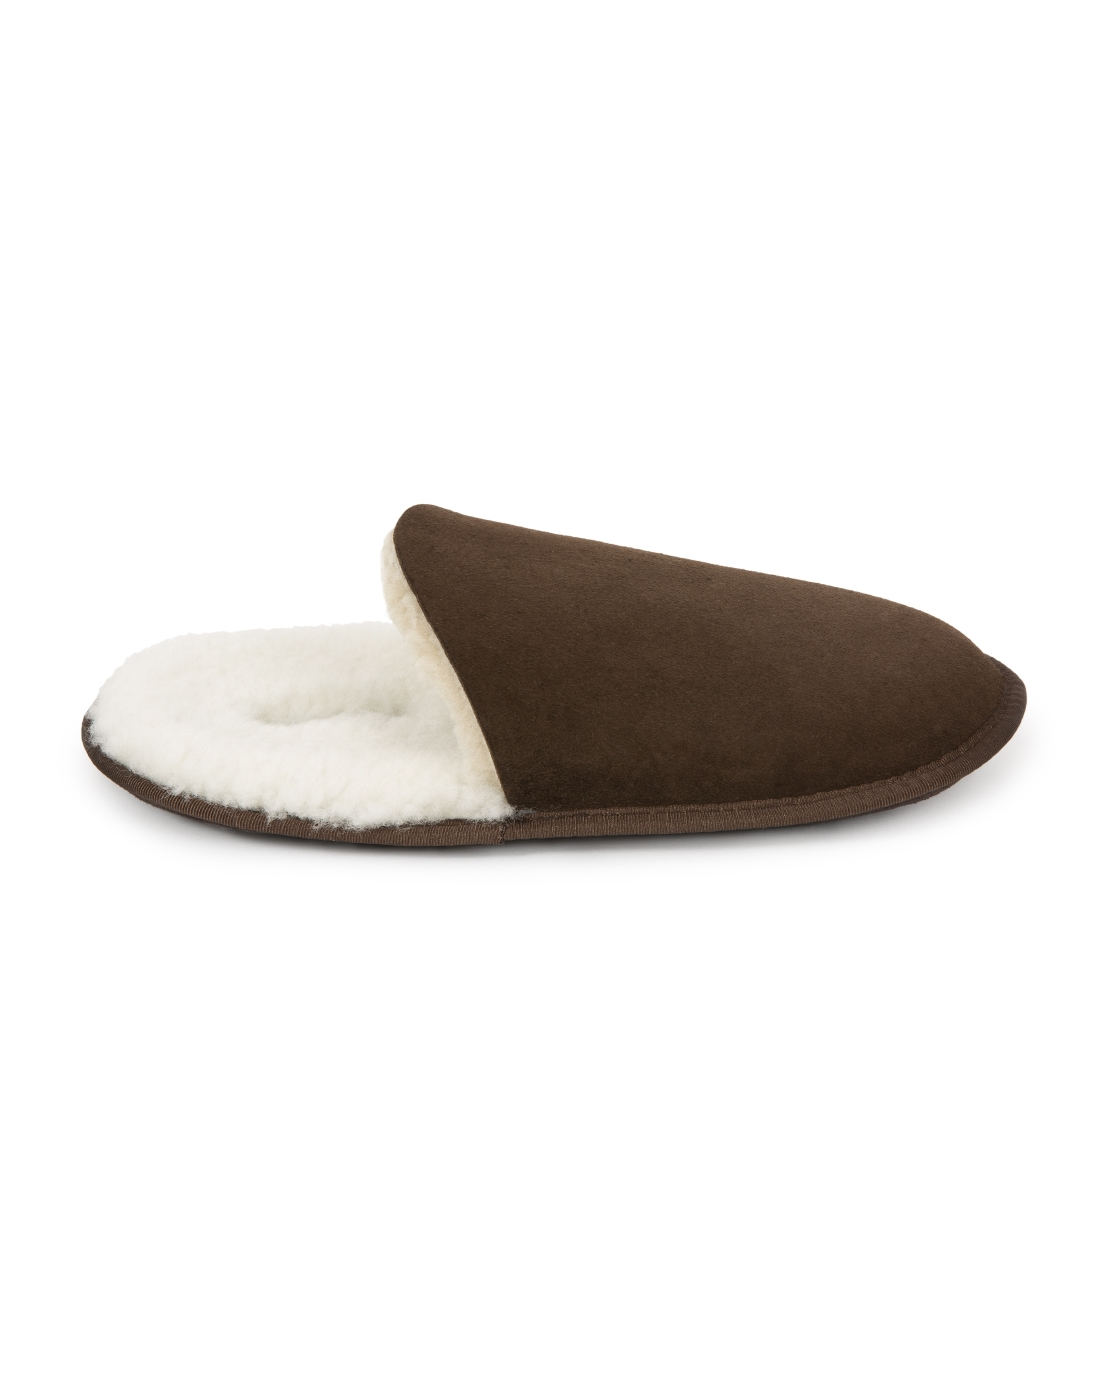 barrington_scuff_mocca cream wool_side.jpg